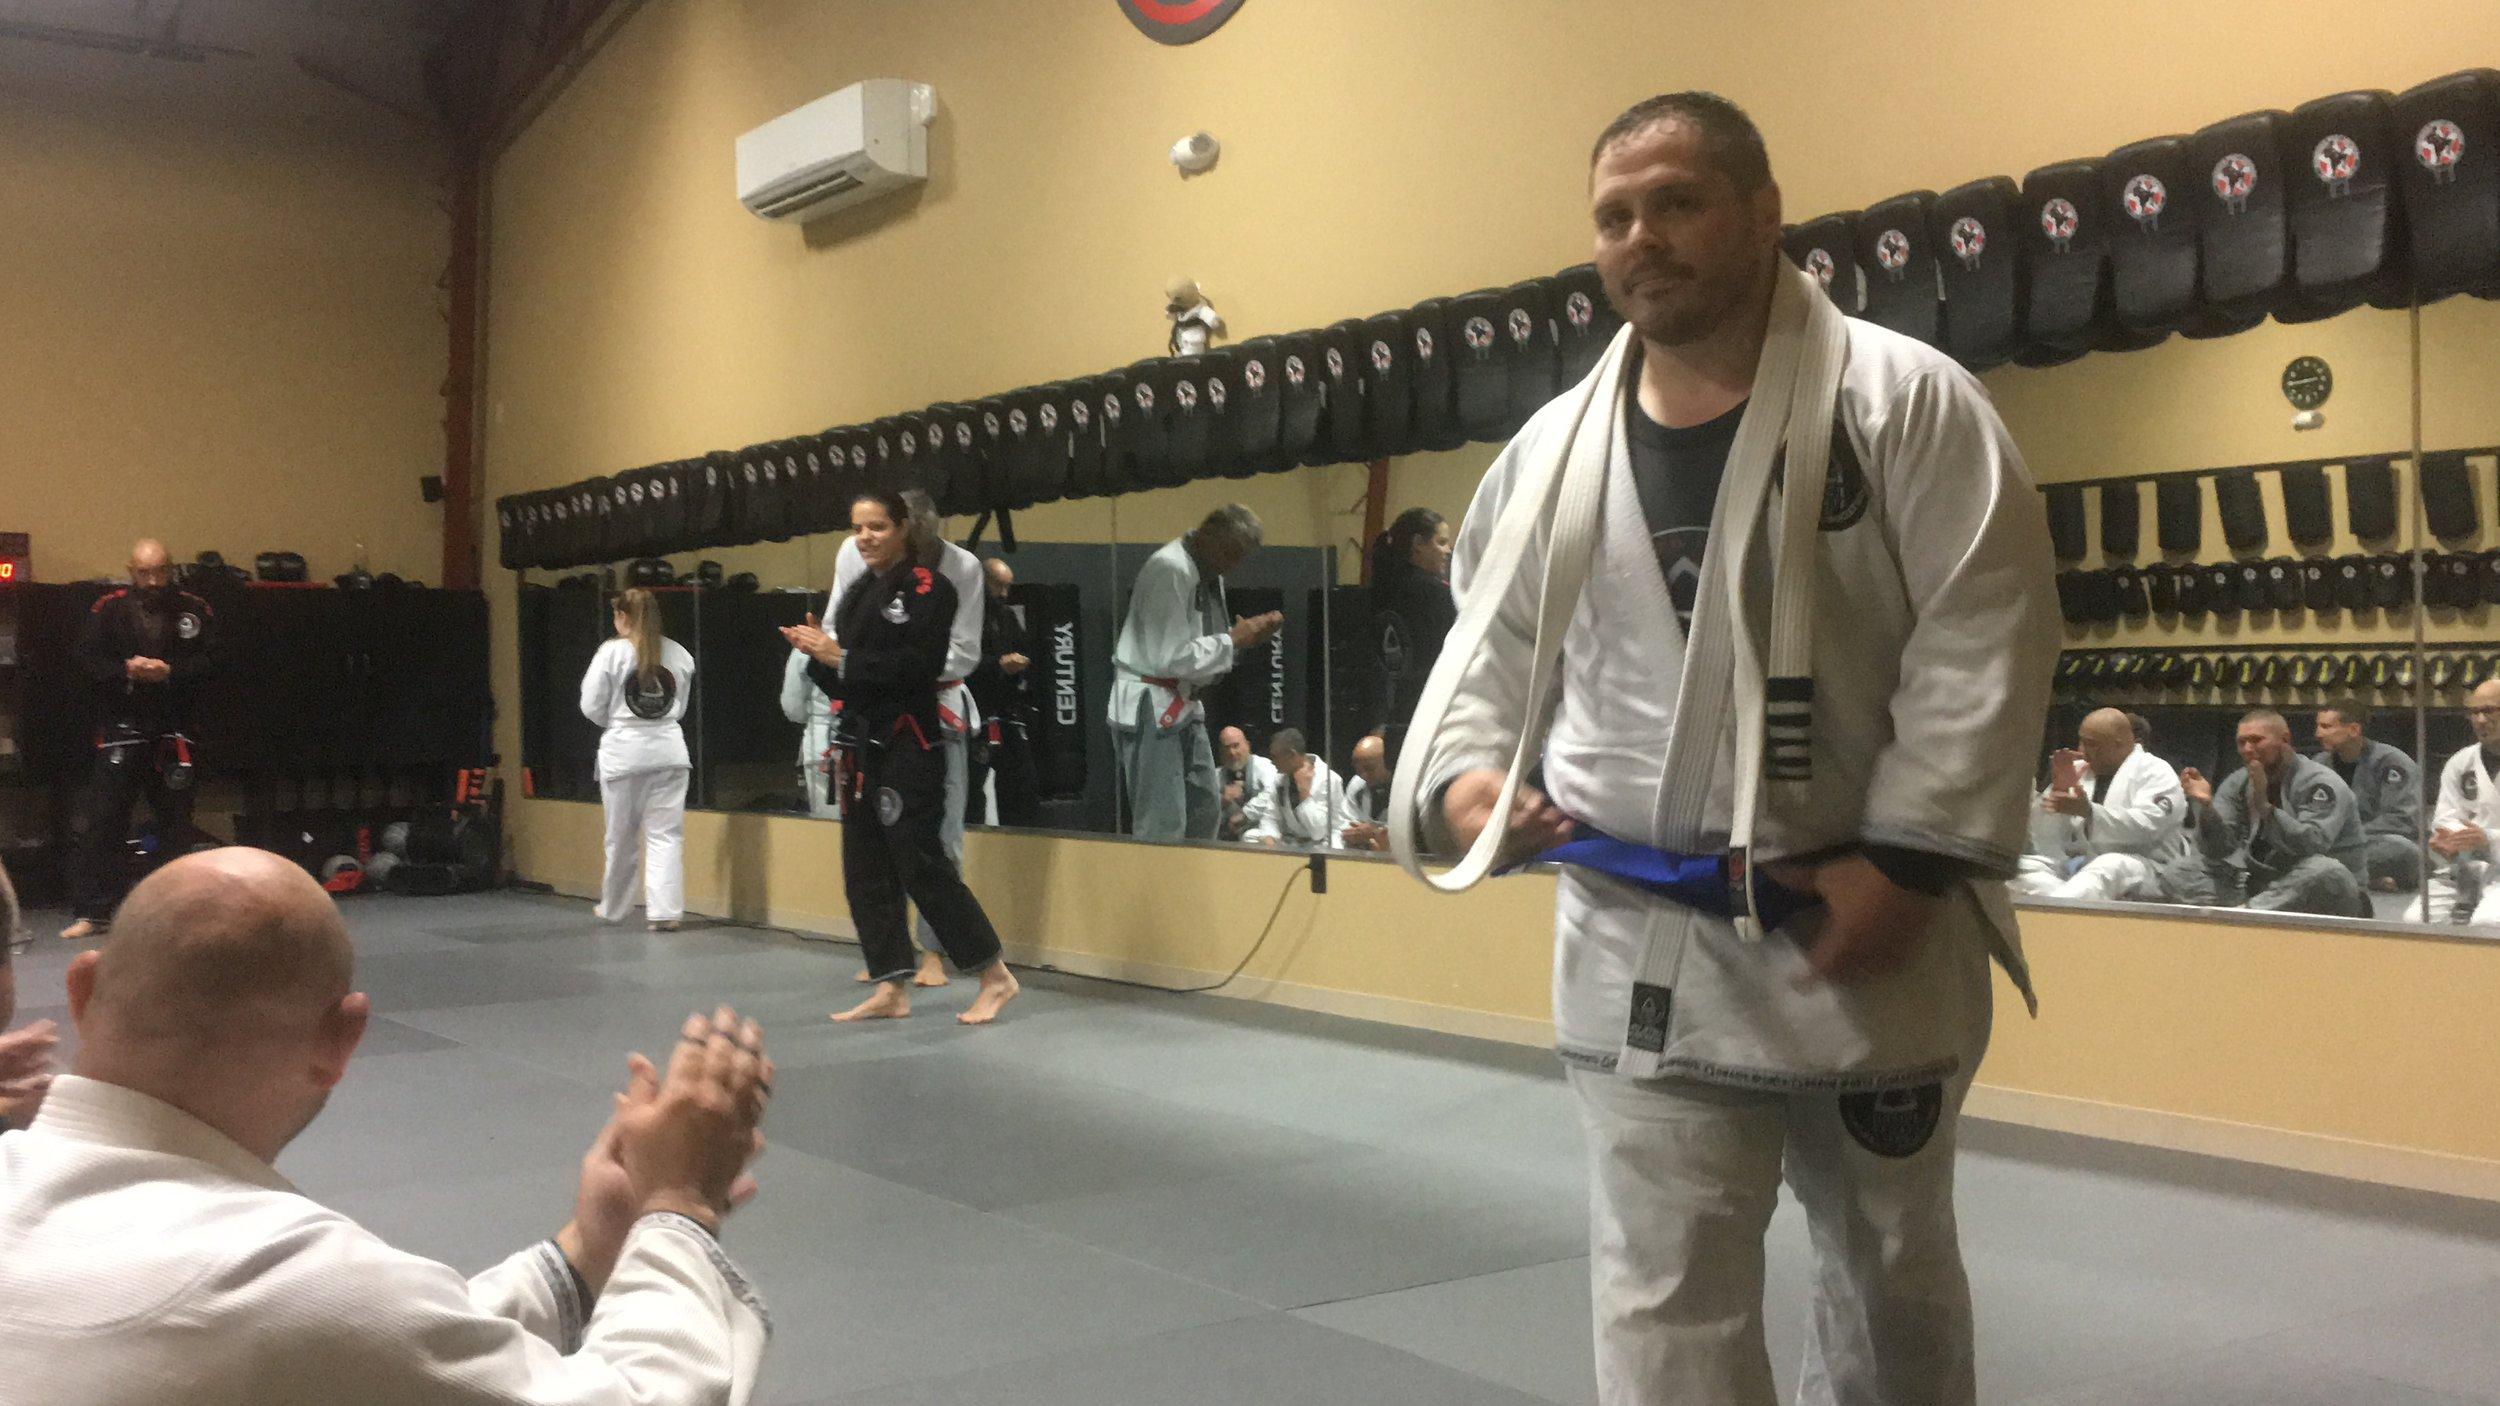 The old belt and the new belt felt like progress.